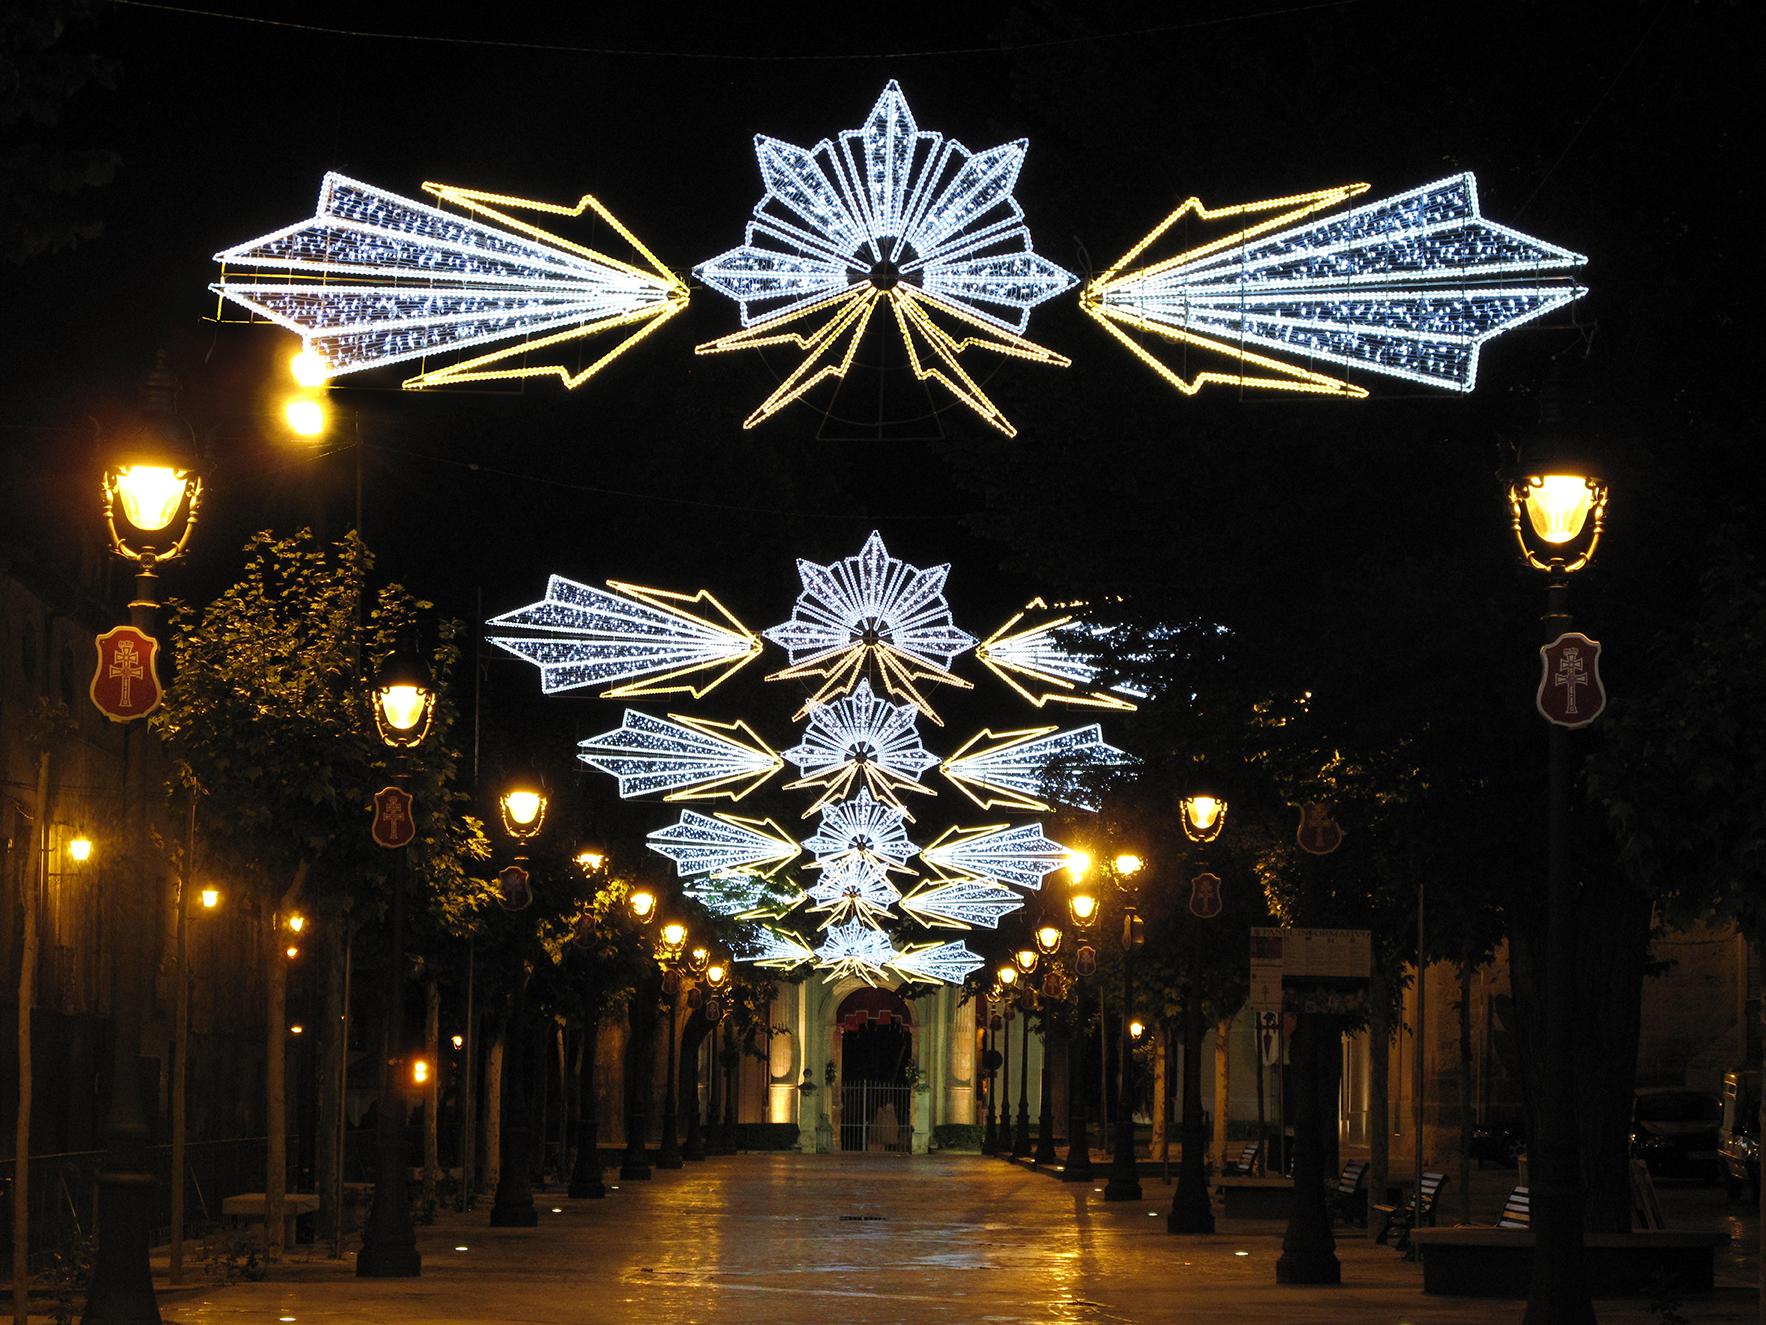 Elecfes Iluminaciones Fiesta 10